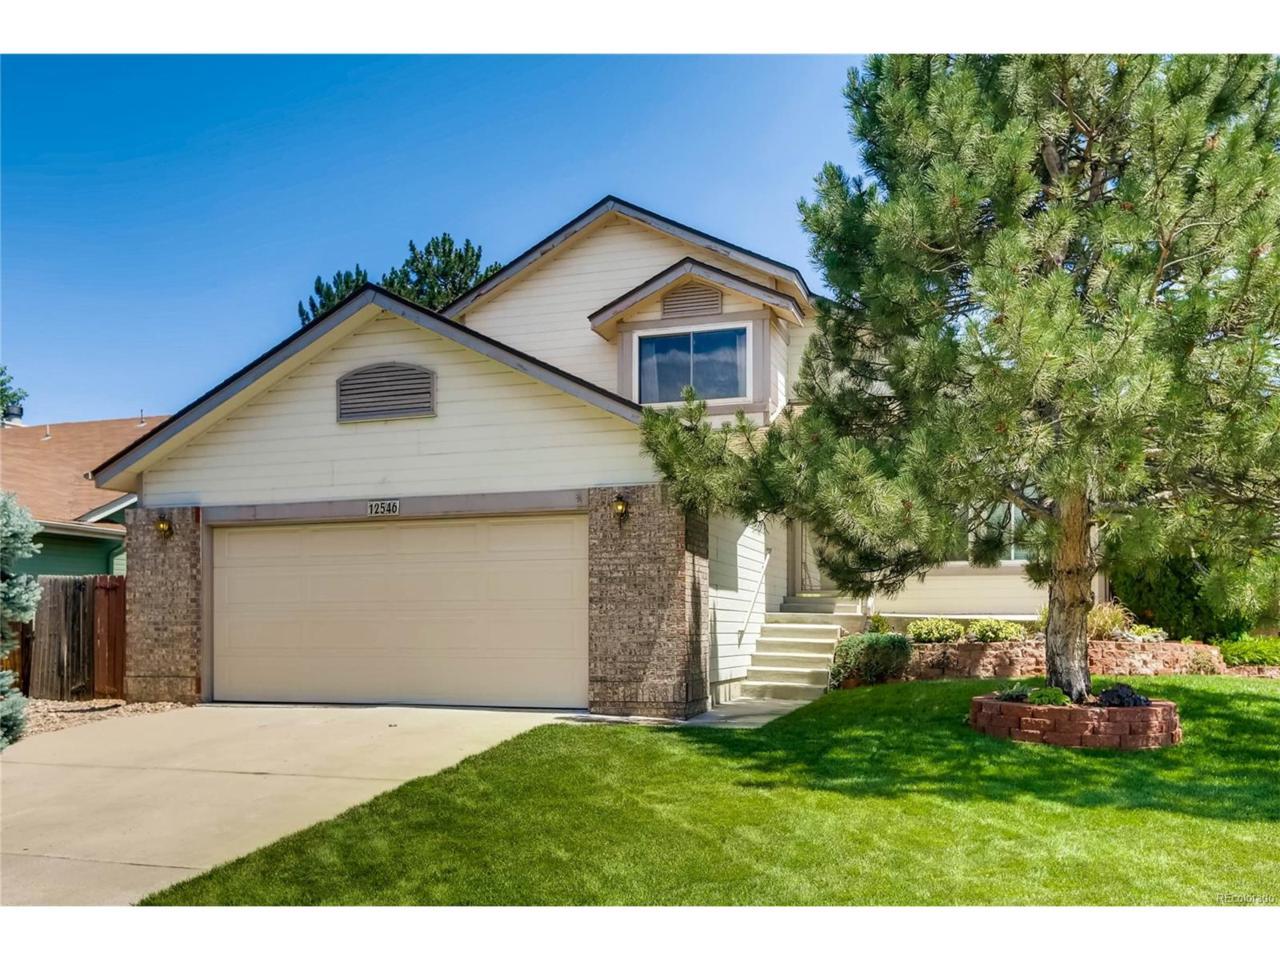 12546 Mckenzie Court, Broomfield, CO 80020 (MLS #4041597) :: 8z Real Estate